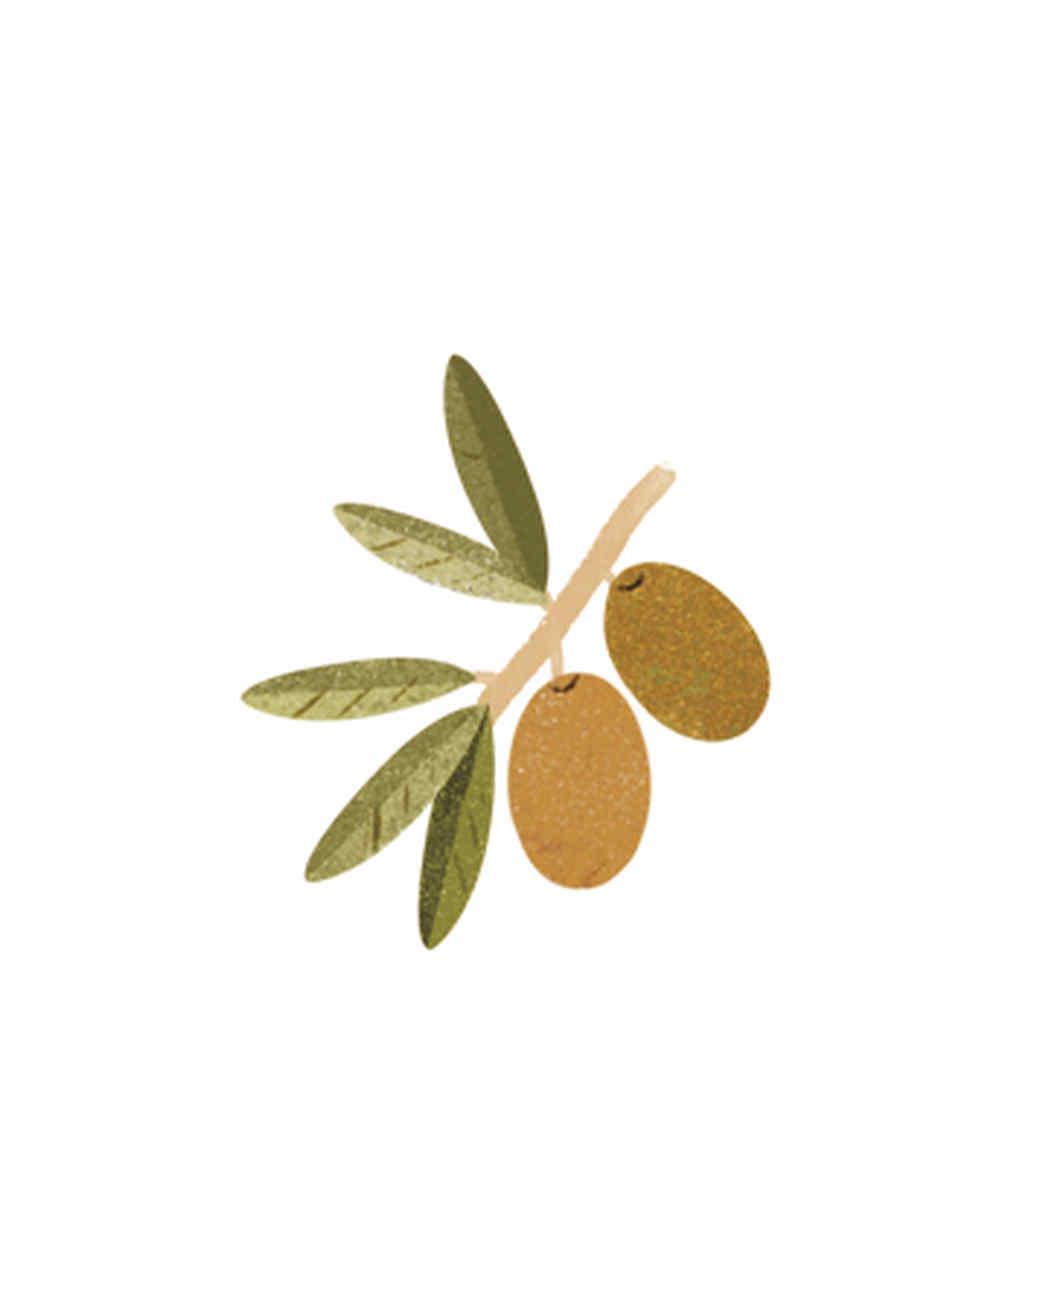 essential-oils-illustration-15.jpg